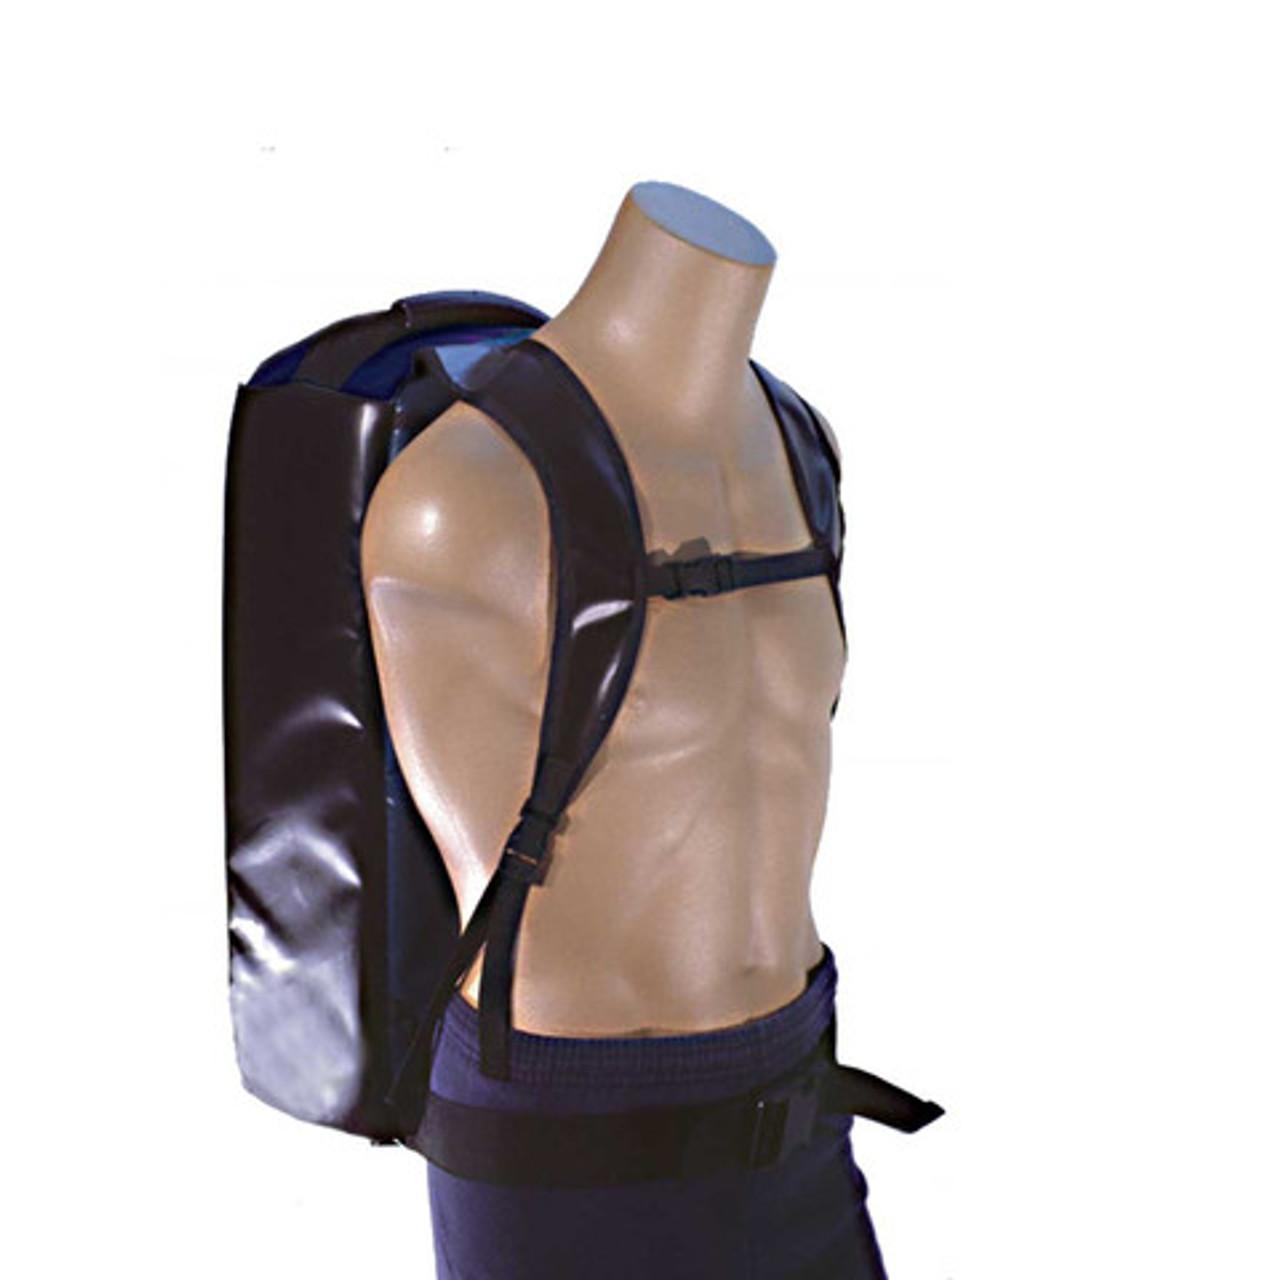 Responder Pro Bag by Conterra